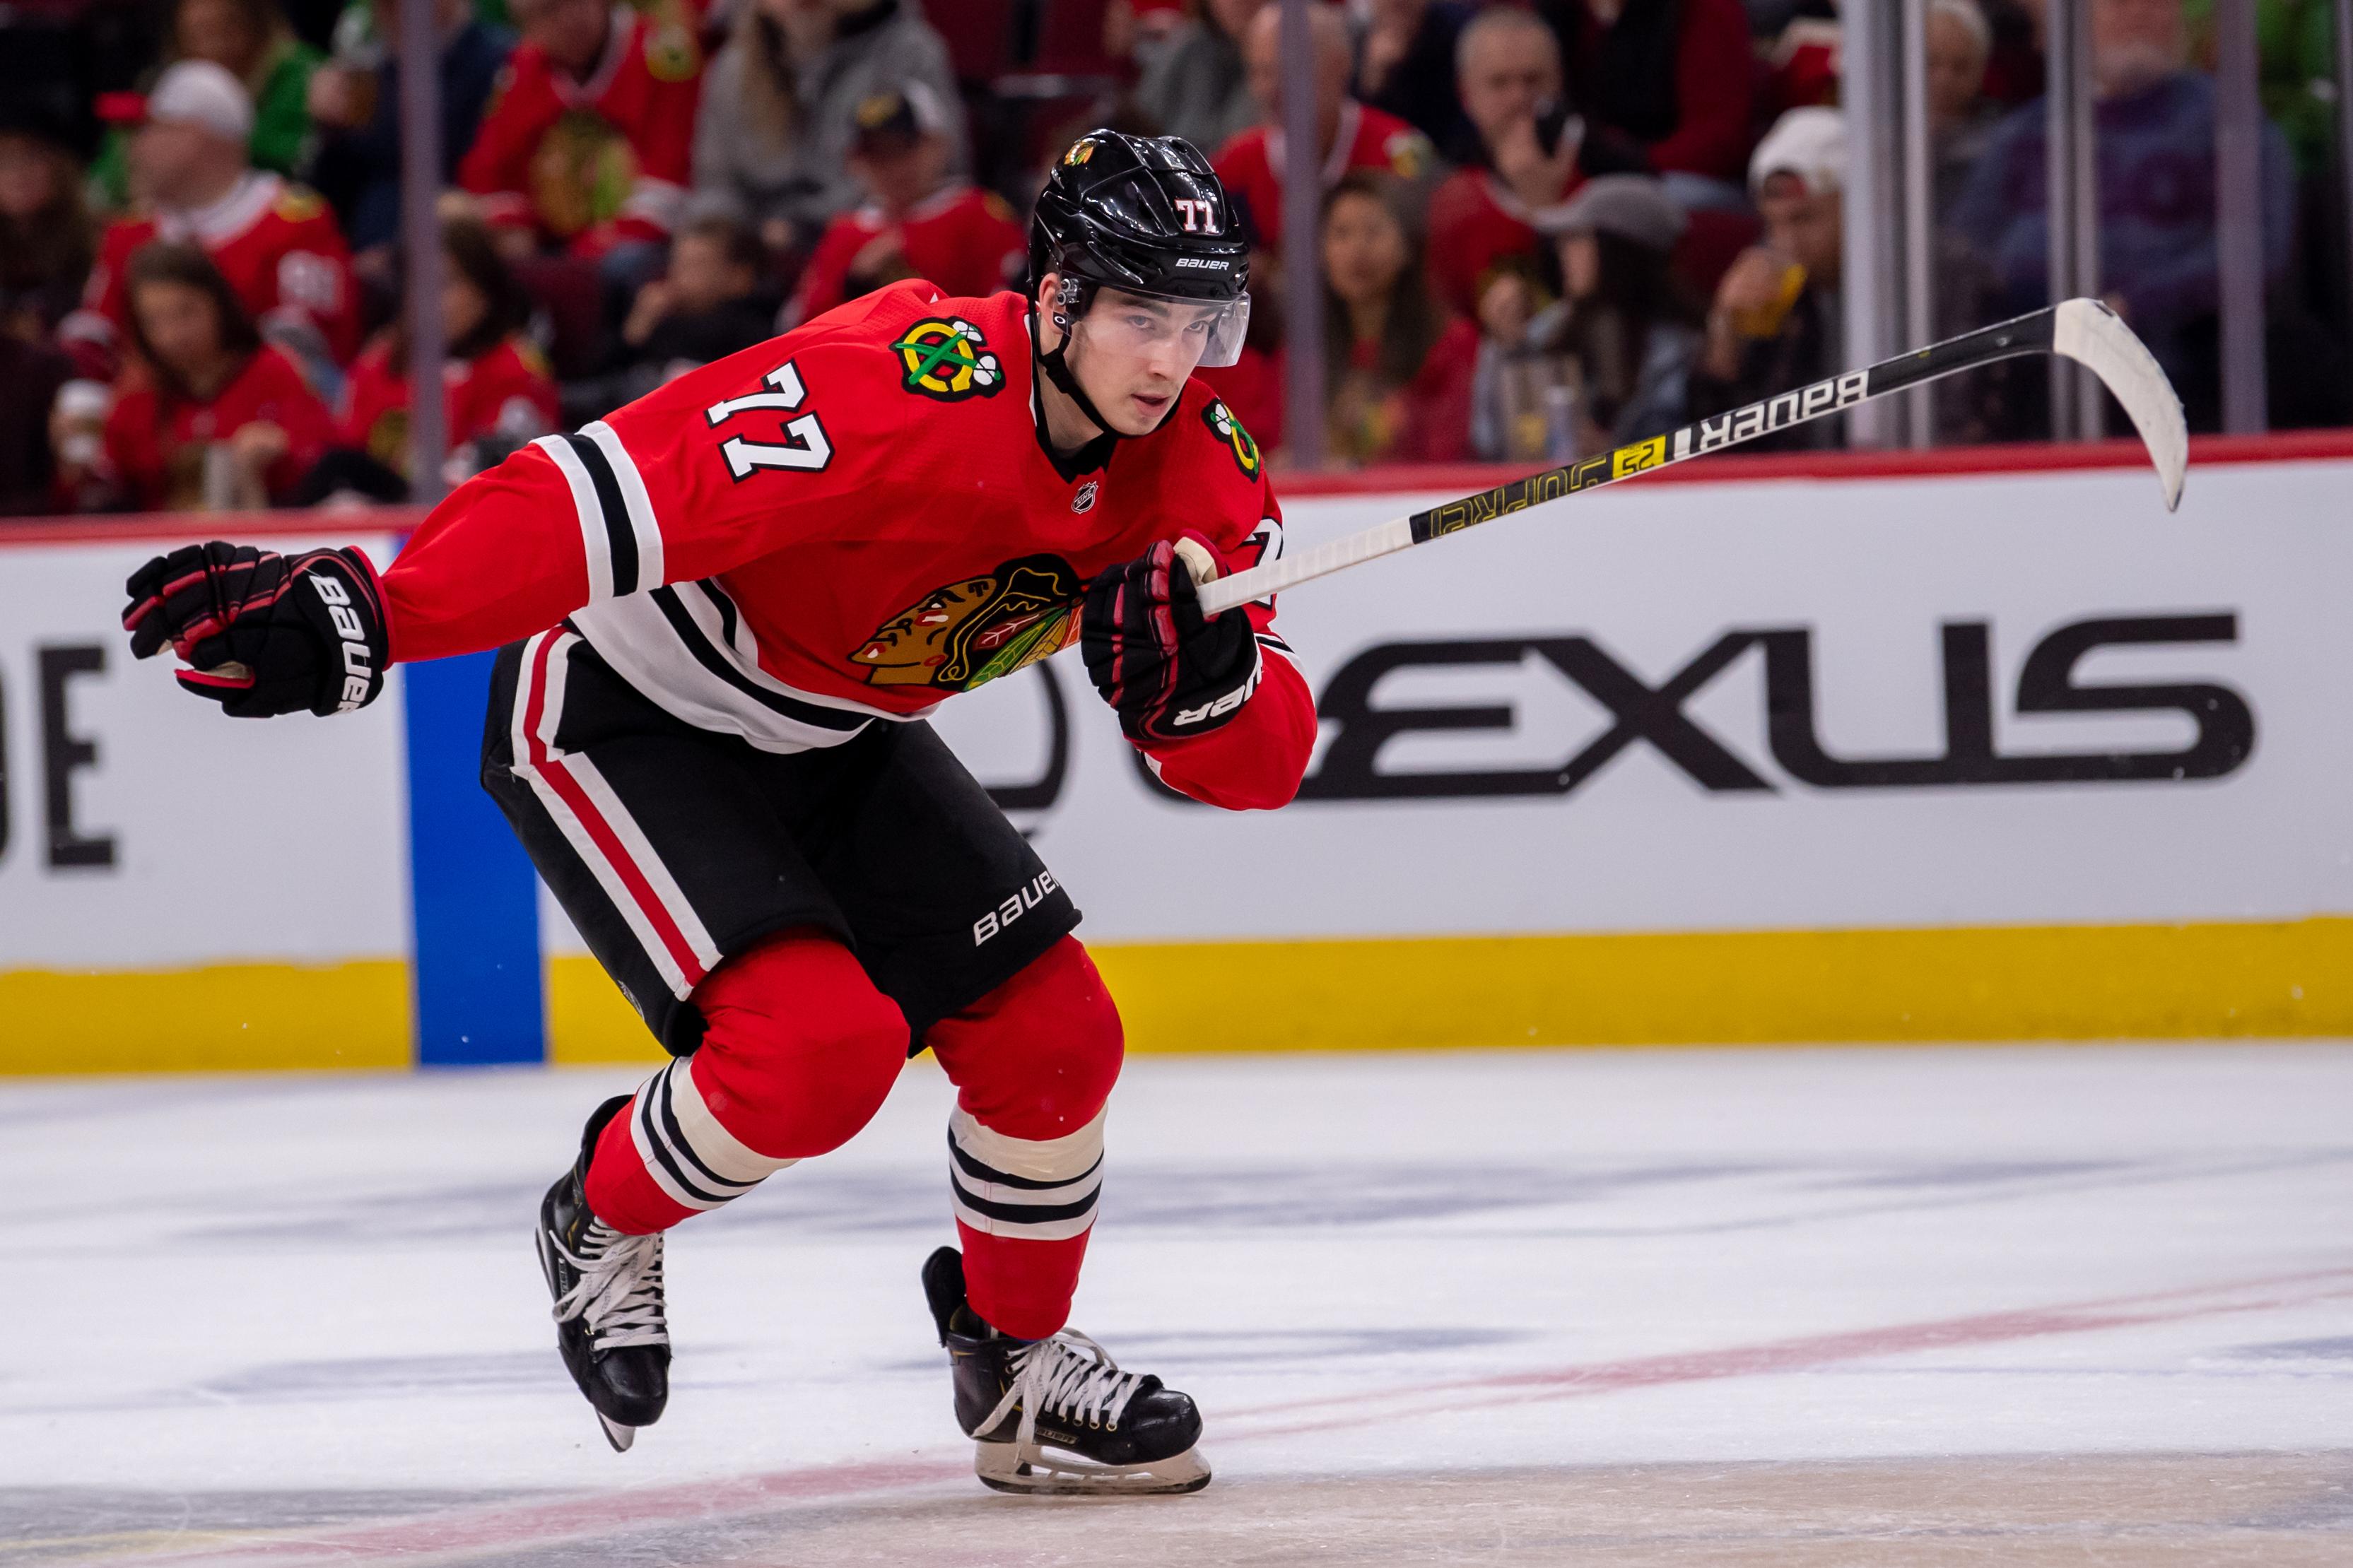 NHL: NOV 26 Stars at Blackhawks